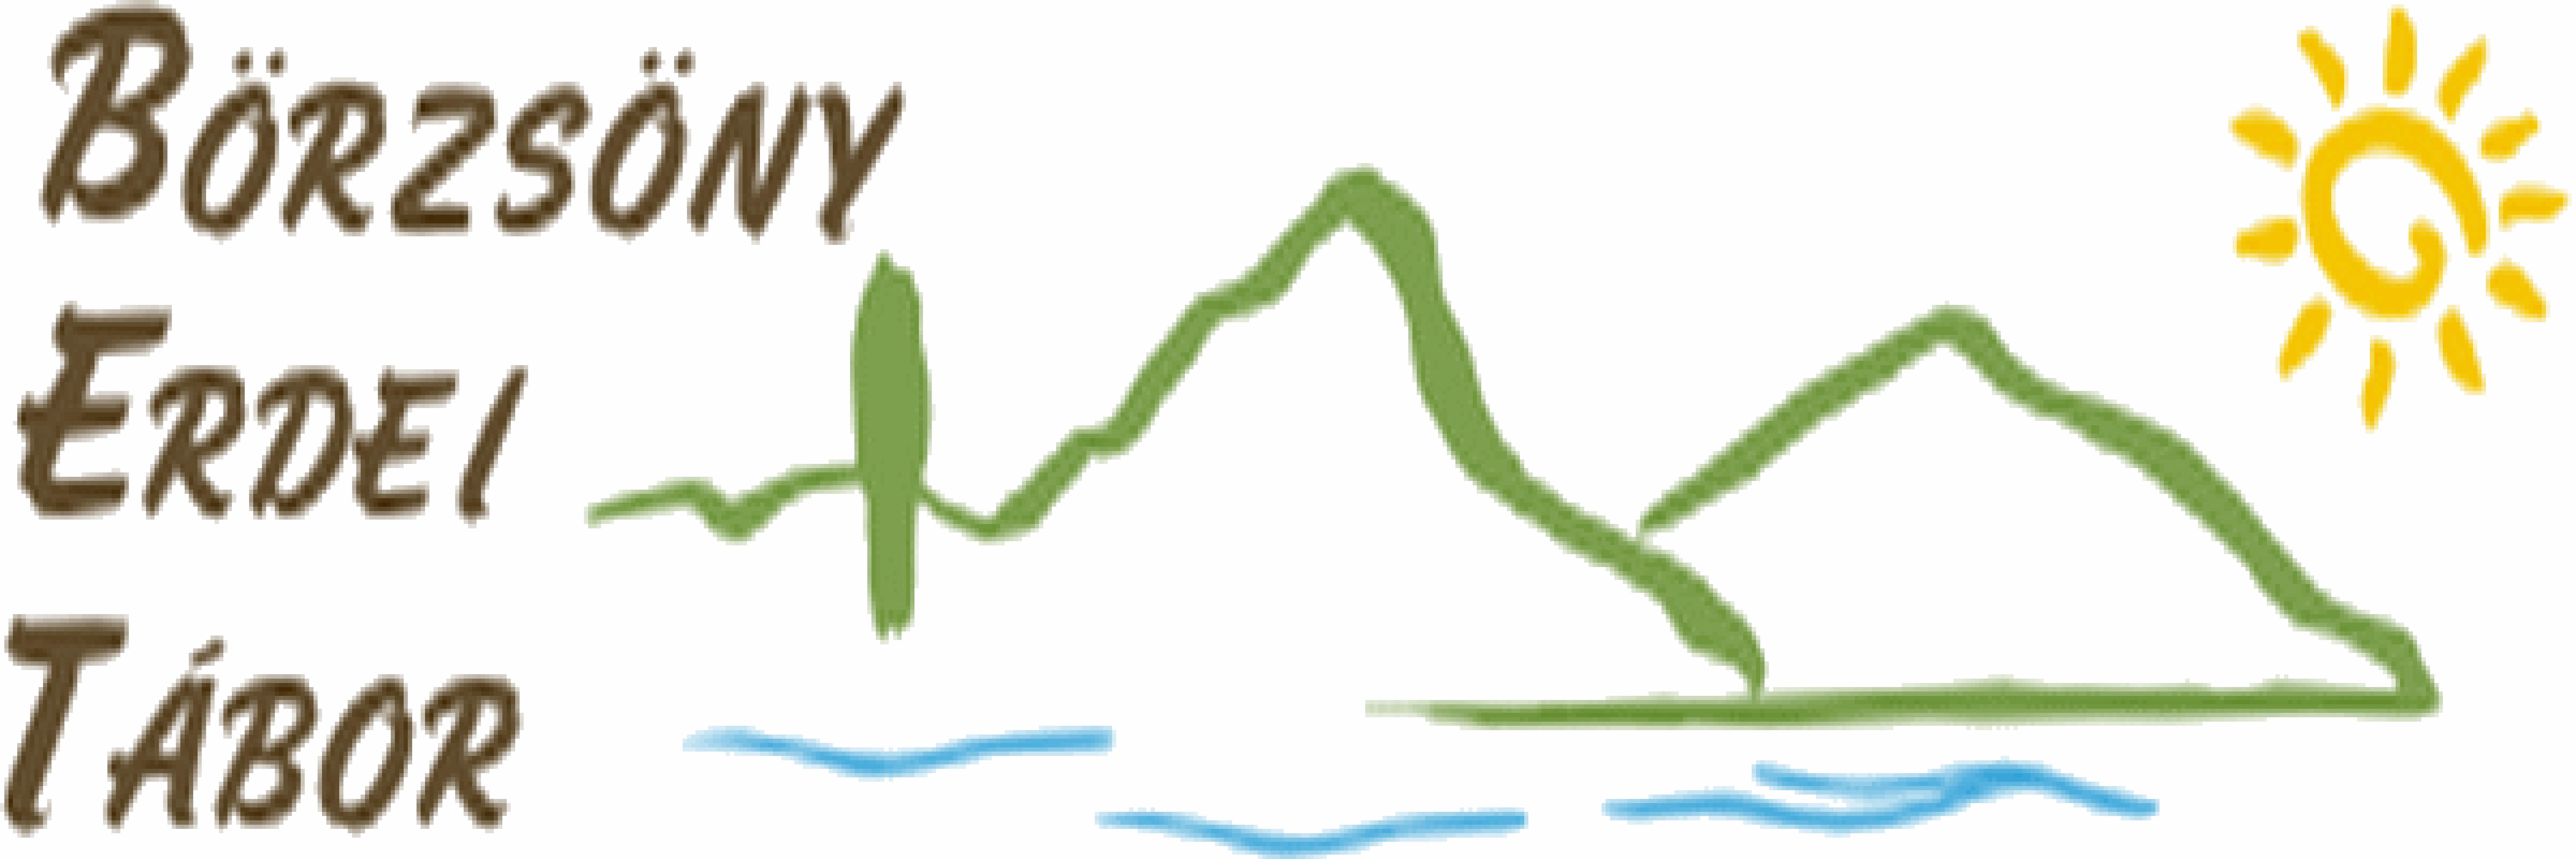 Börzsöny erdei tábor